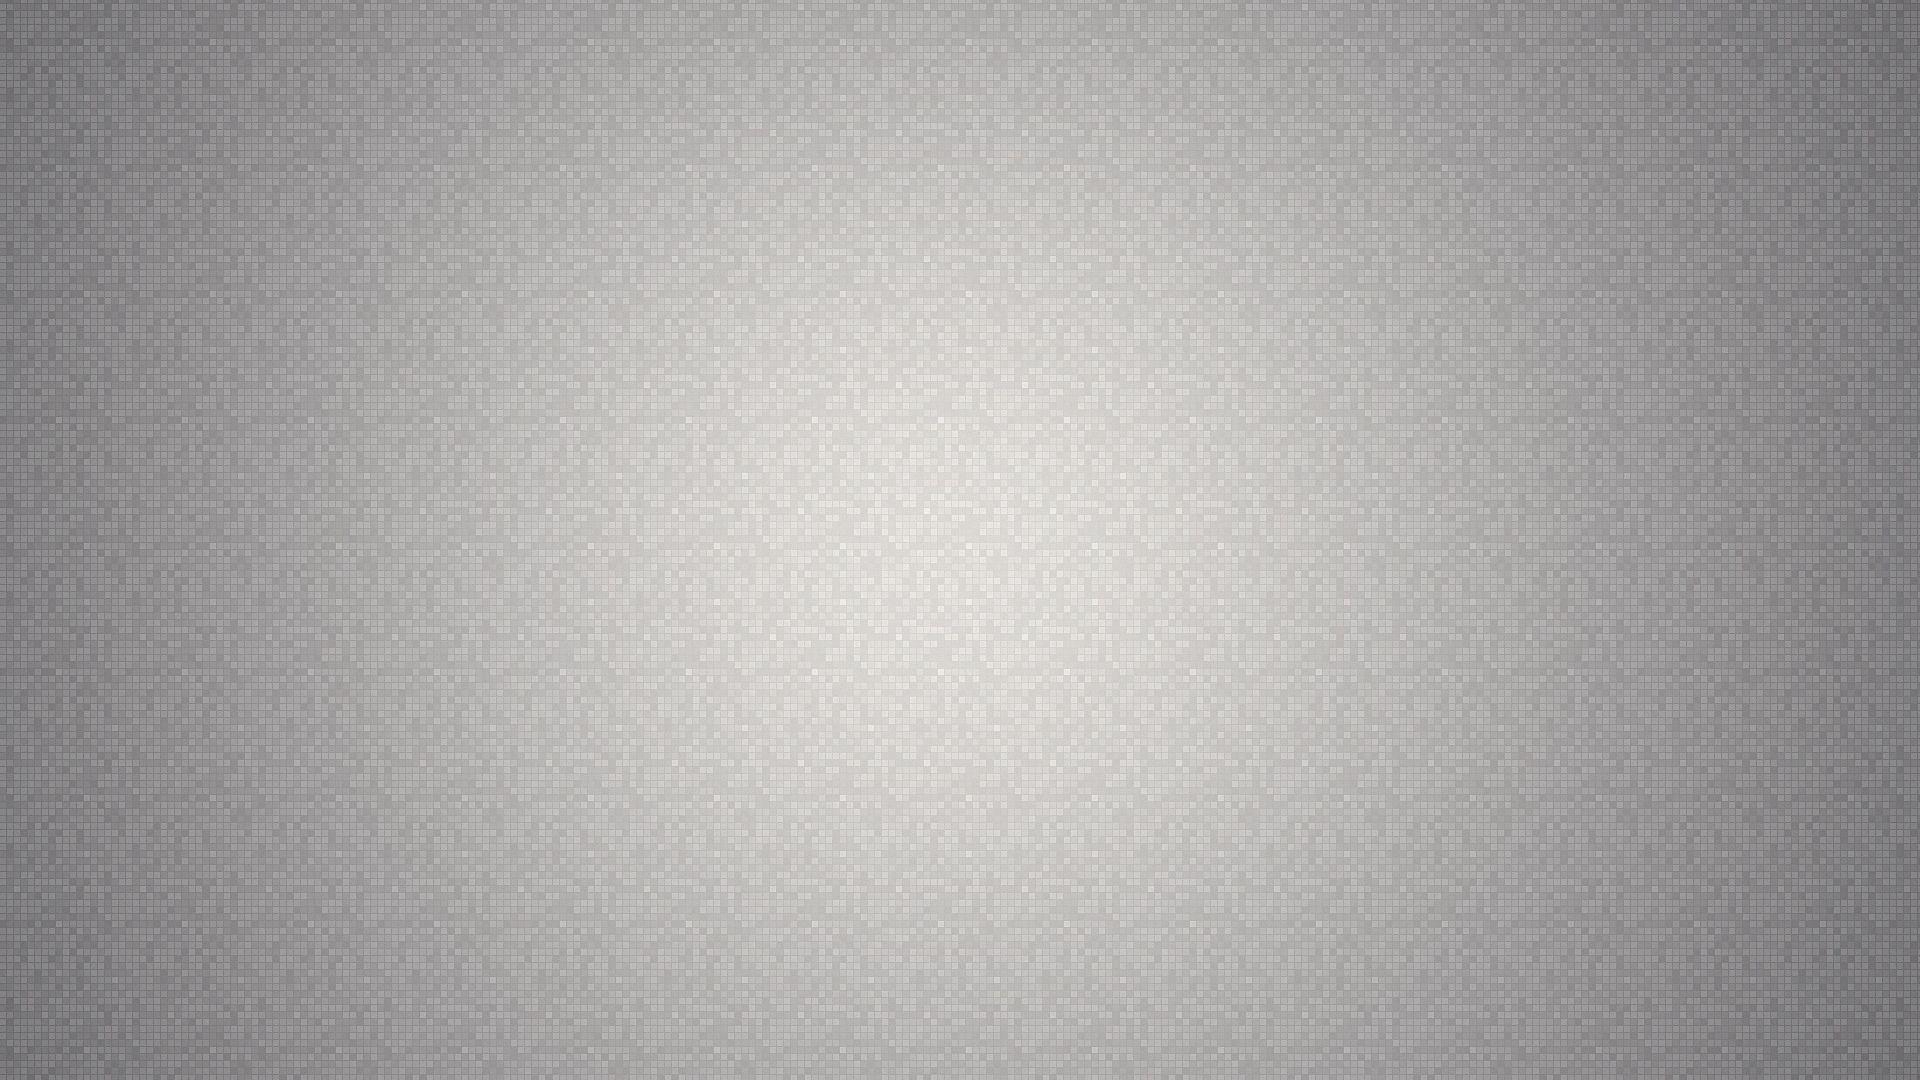 Light Grey Wallpaper Image